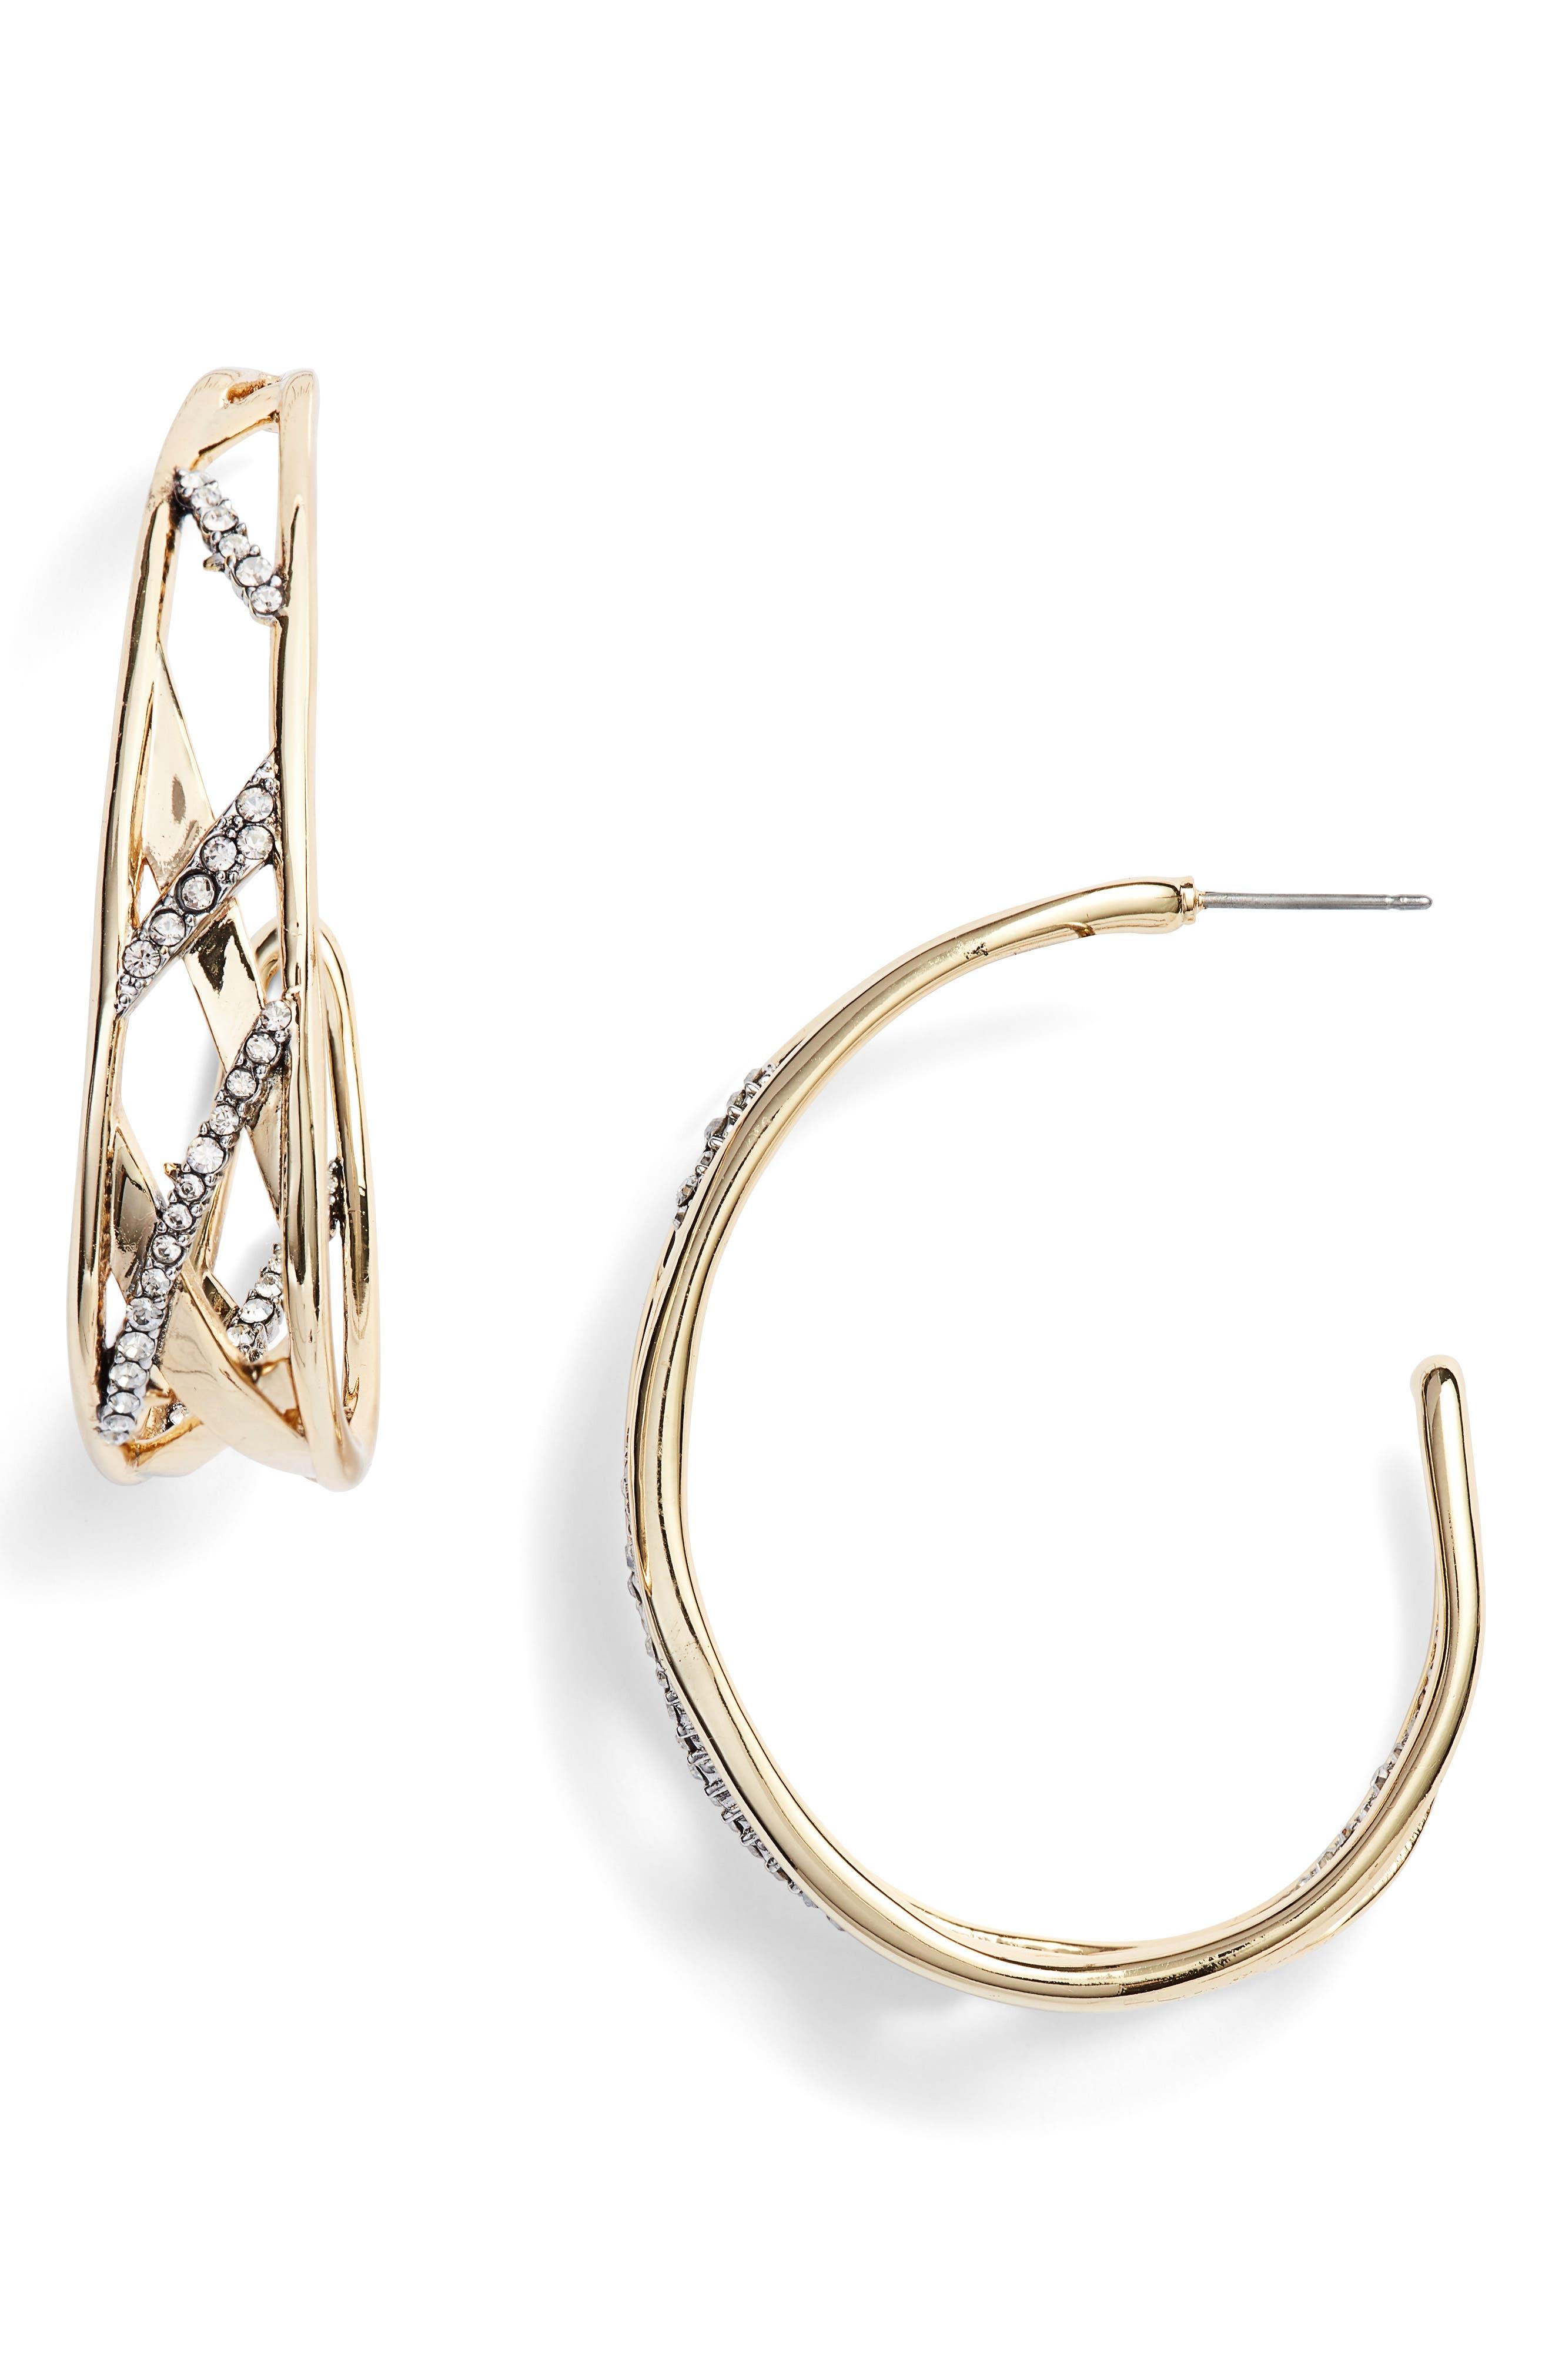 Plaid Hoop Earrings,                             Main thumbnail 1, color,                             GOLD/ SILVER